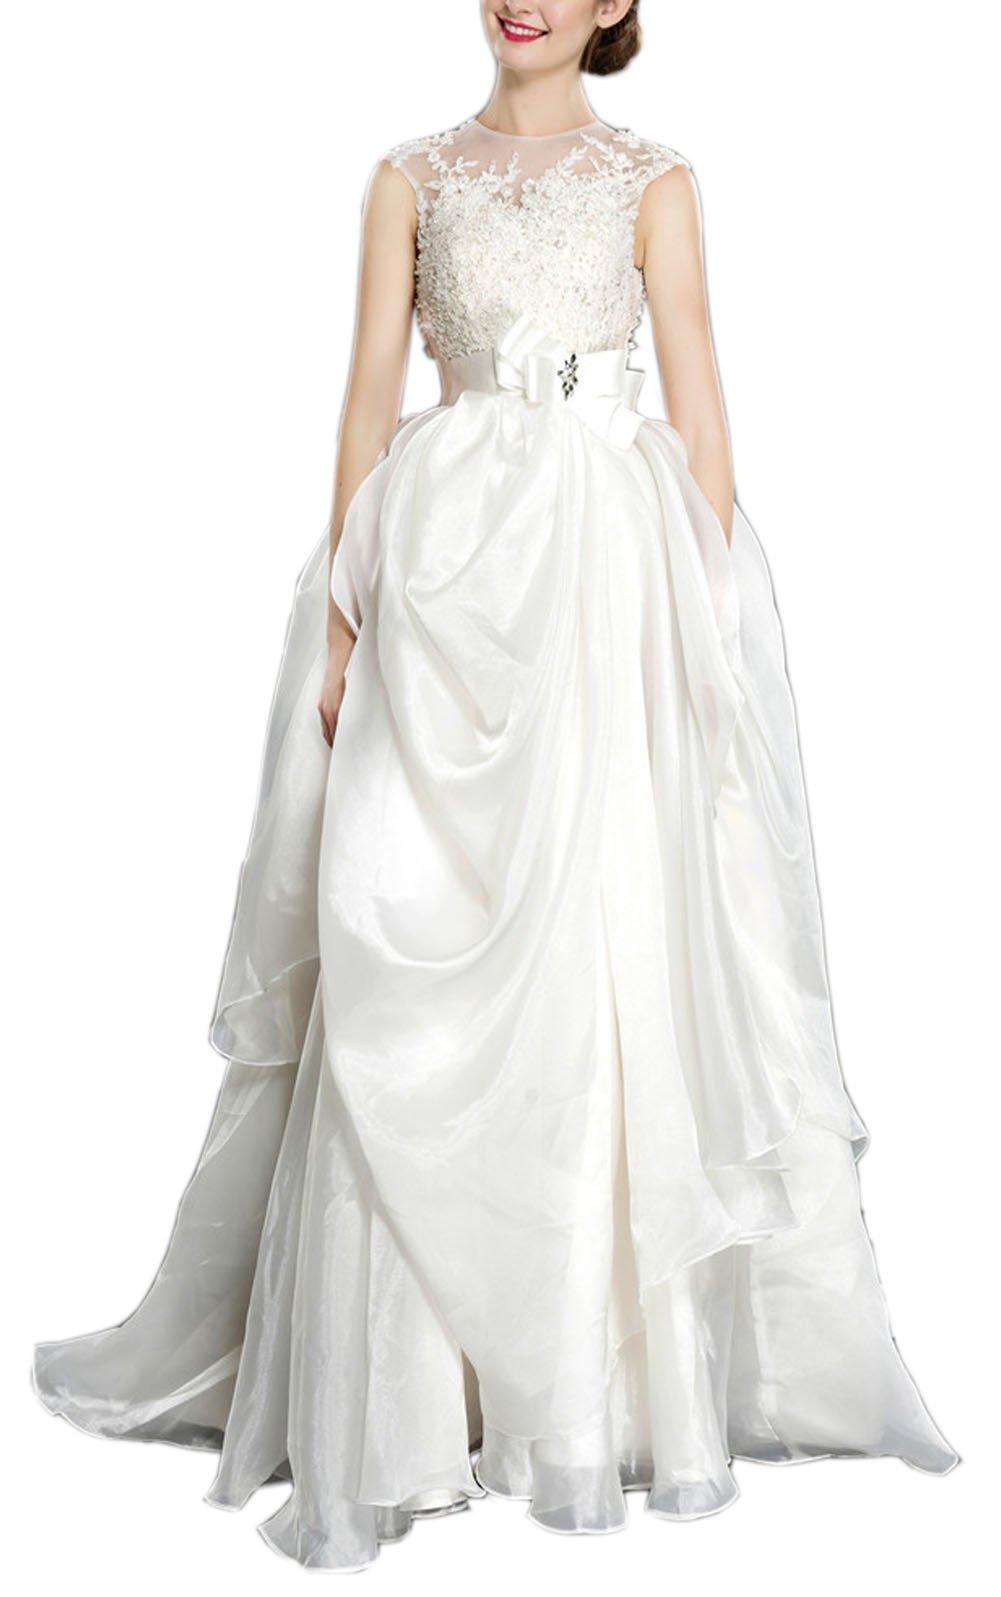 Sayadress Women's Jewel Lace Applique Bow Sash Ruffles Cloud Yarn Wedding Dress Ivory US2